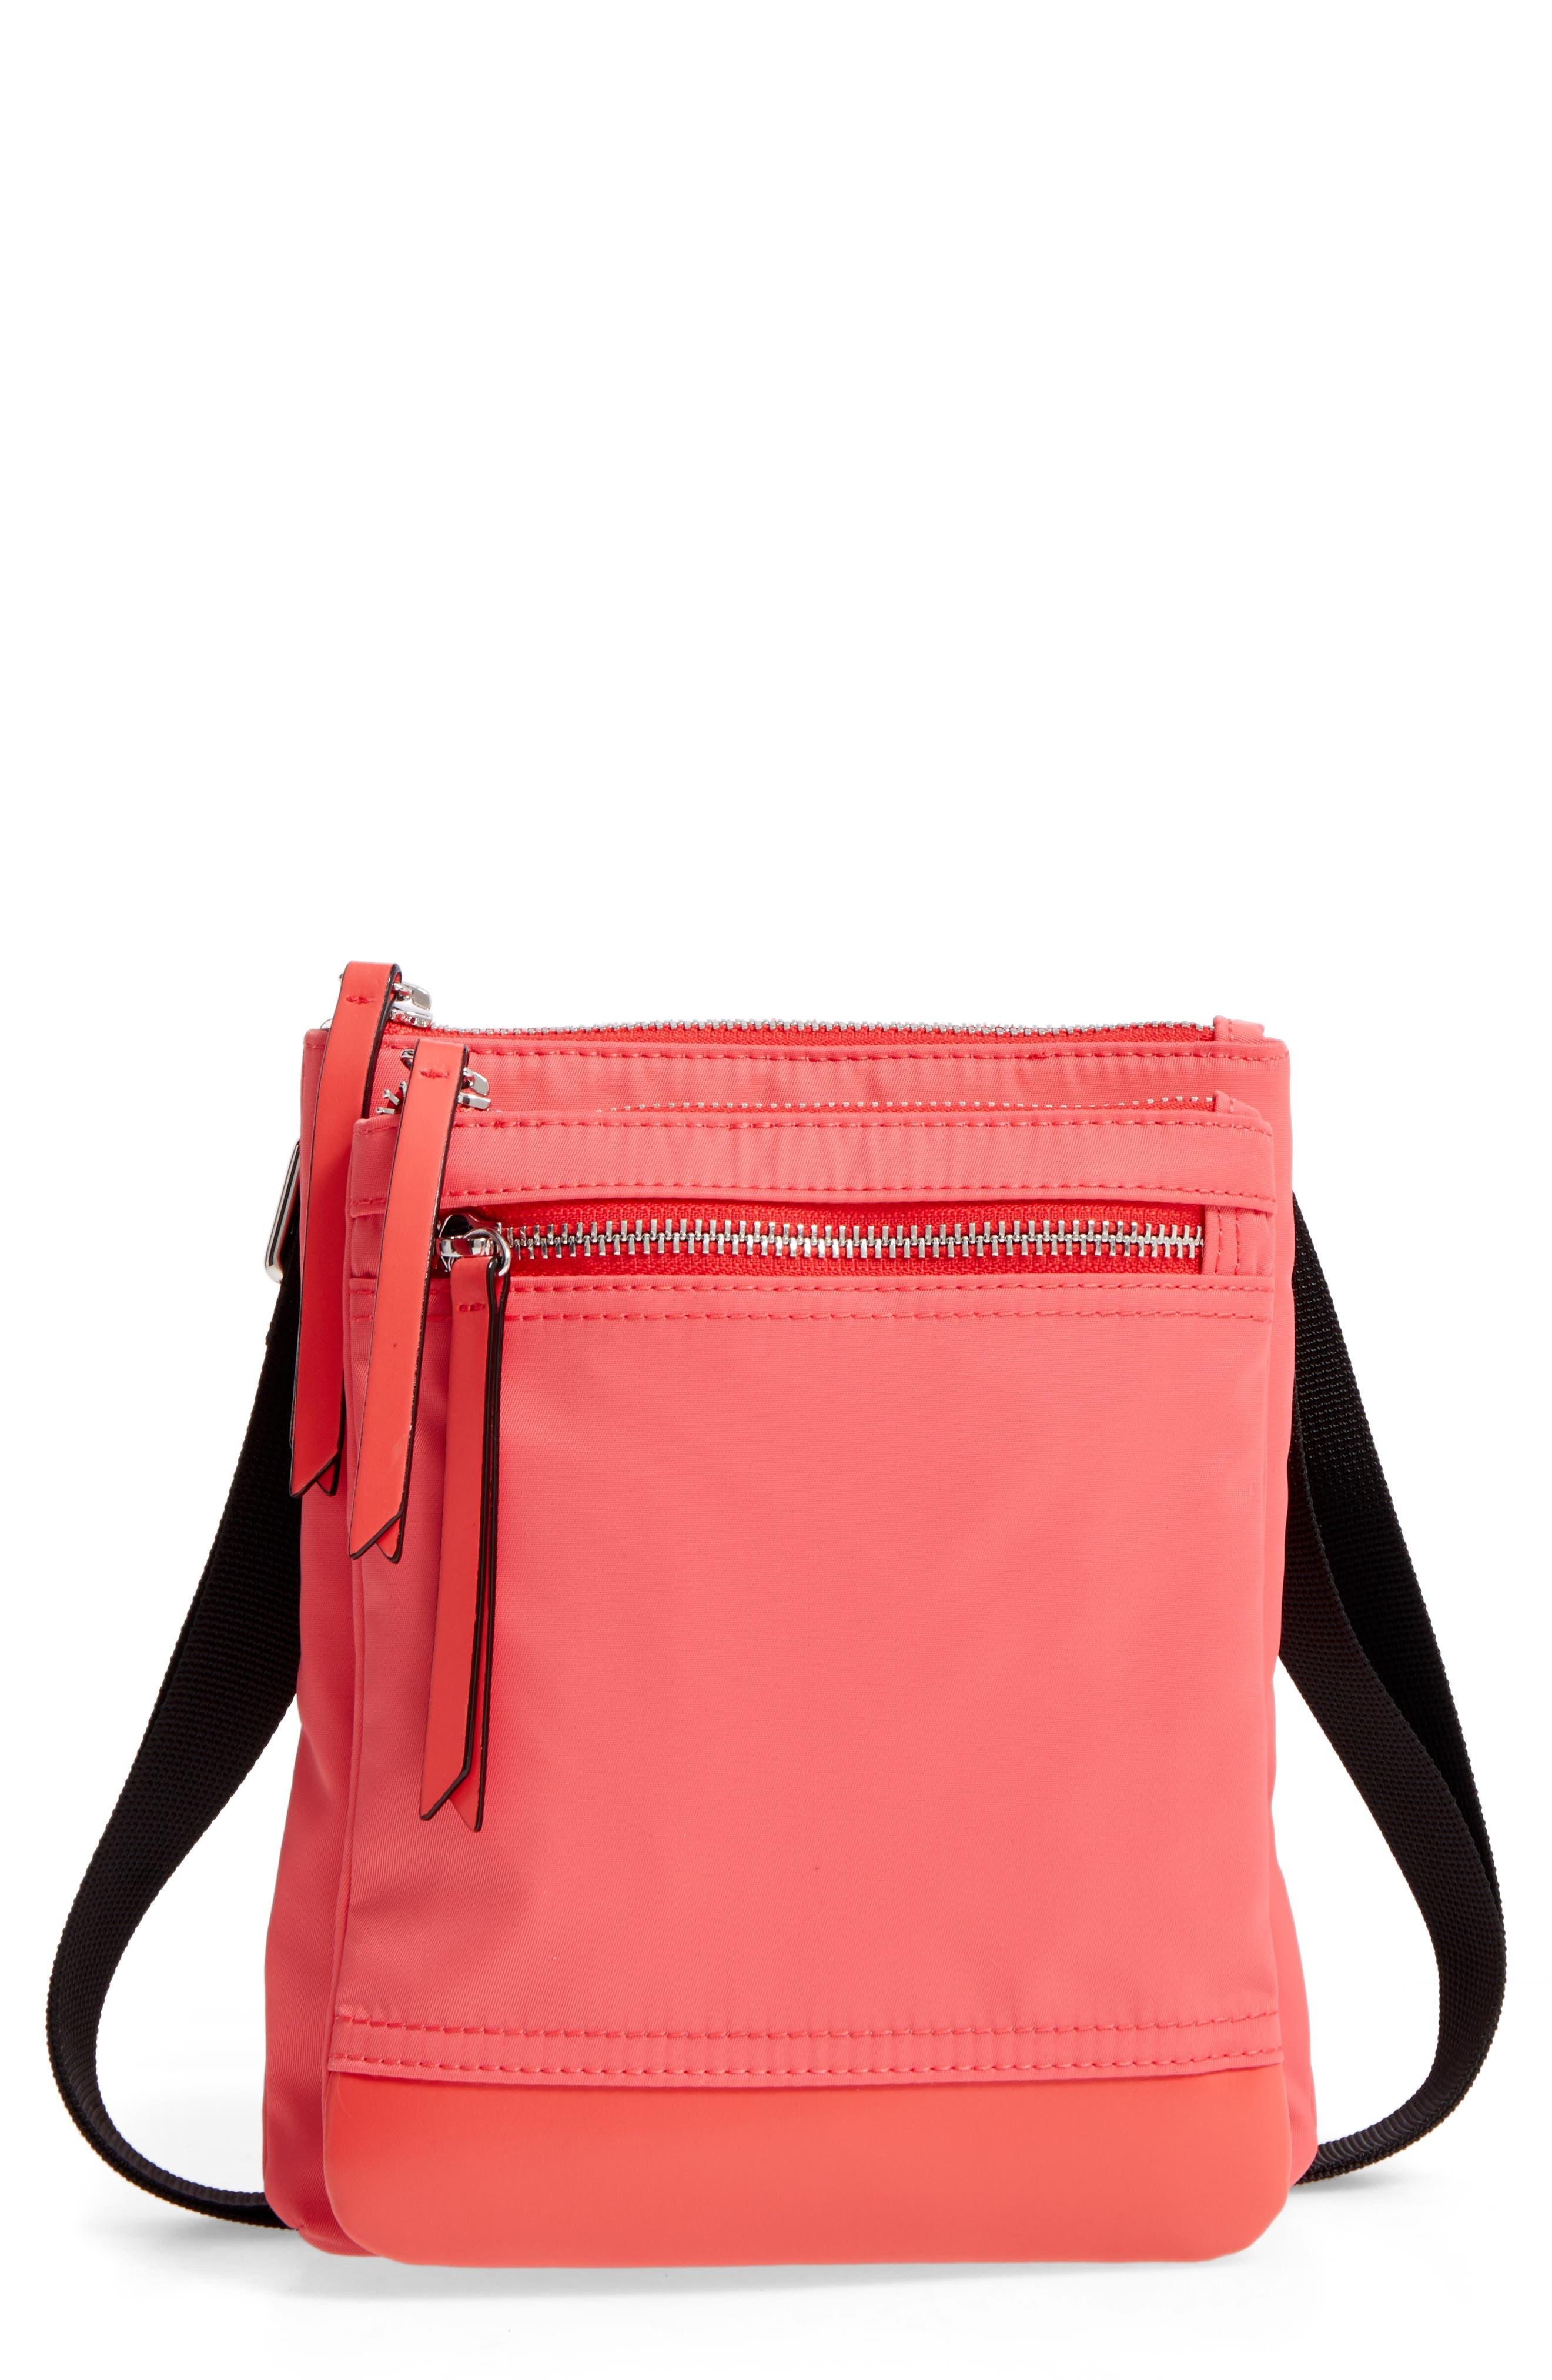 Lodis Zora RFID Nylon & Leather Crossbody Bag